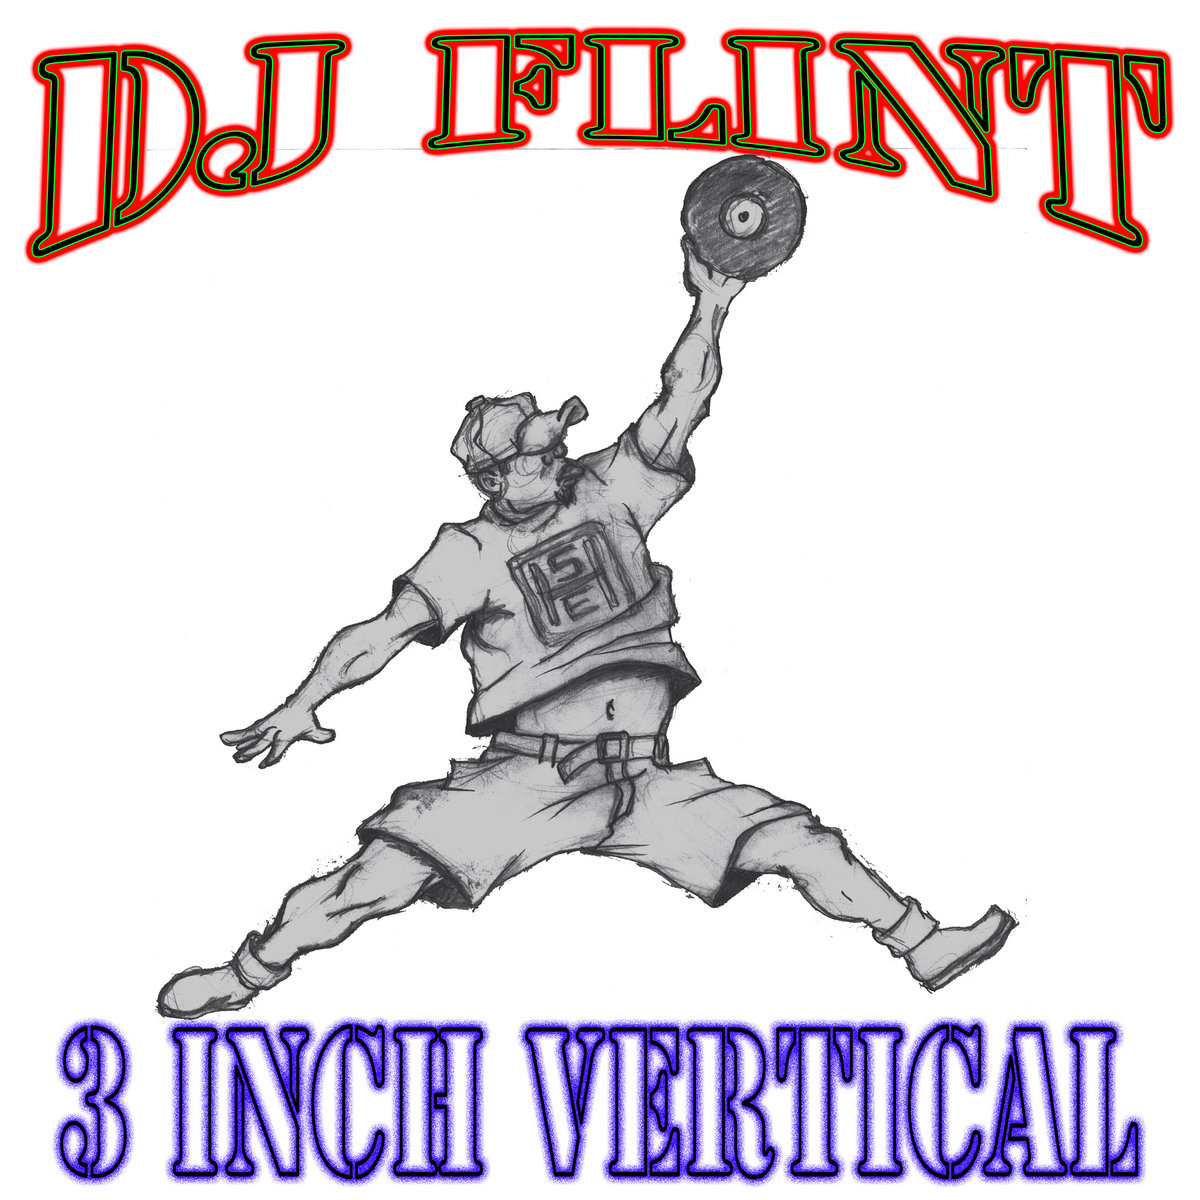 From 3 Inch Vertical By Dj Flint